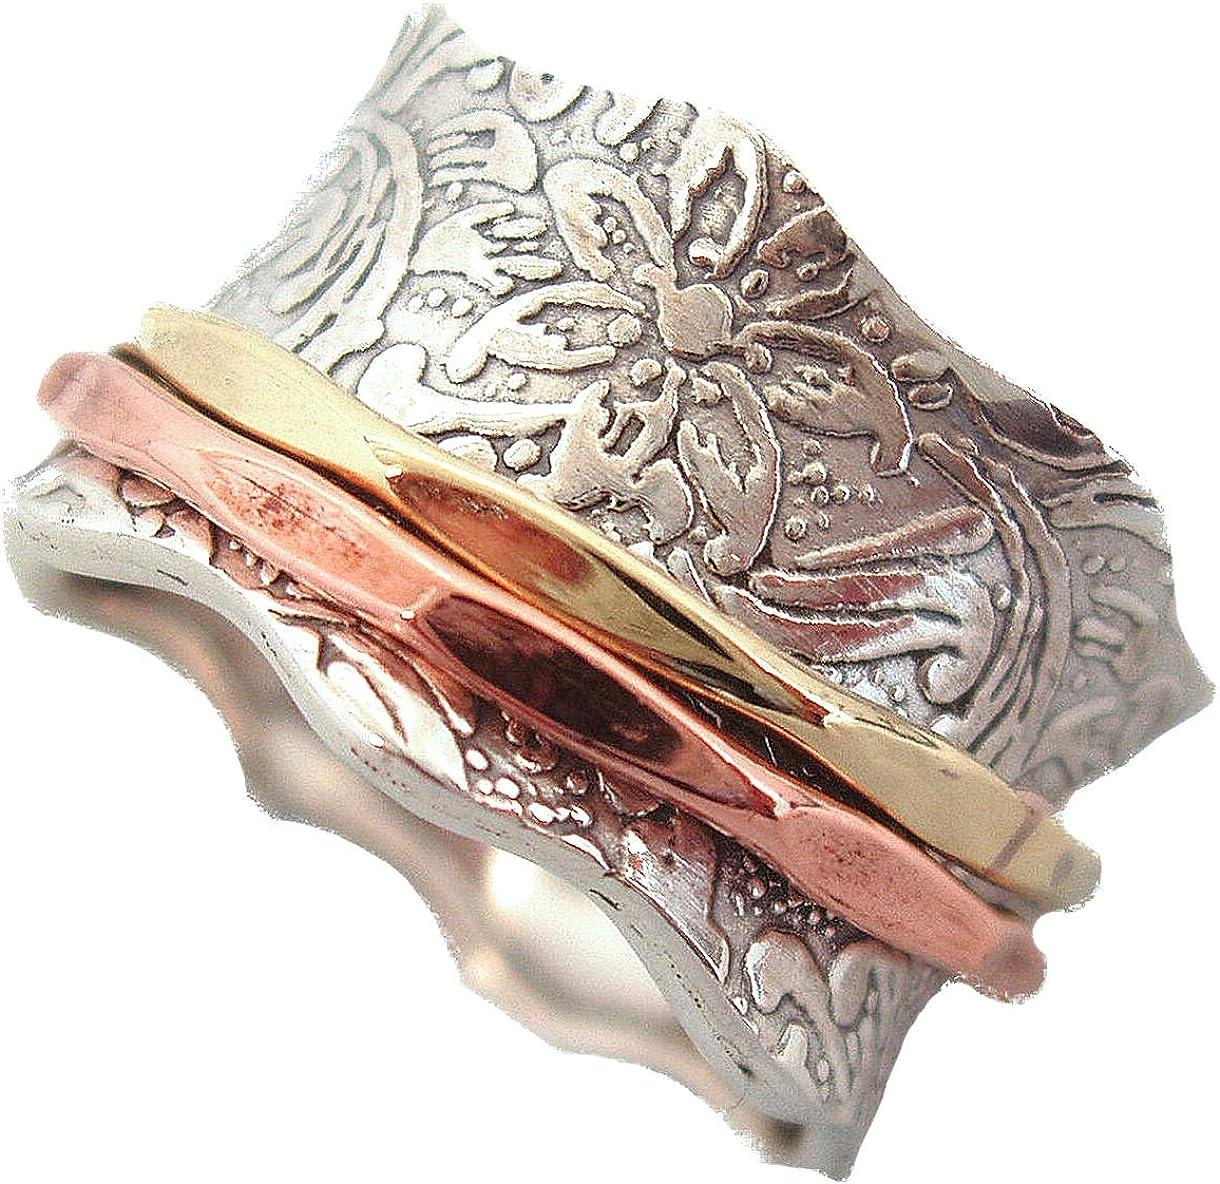 Energy Stone Equilibrio y belleza - Anillo de meditación con motivo de hojas - Con aros de latón y cobre giratorios a su alrededor - Plata de ley - (Modelo 88)